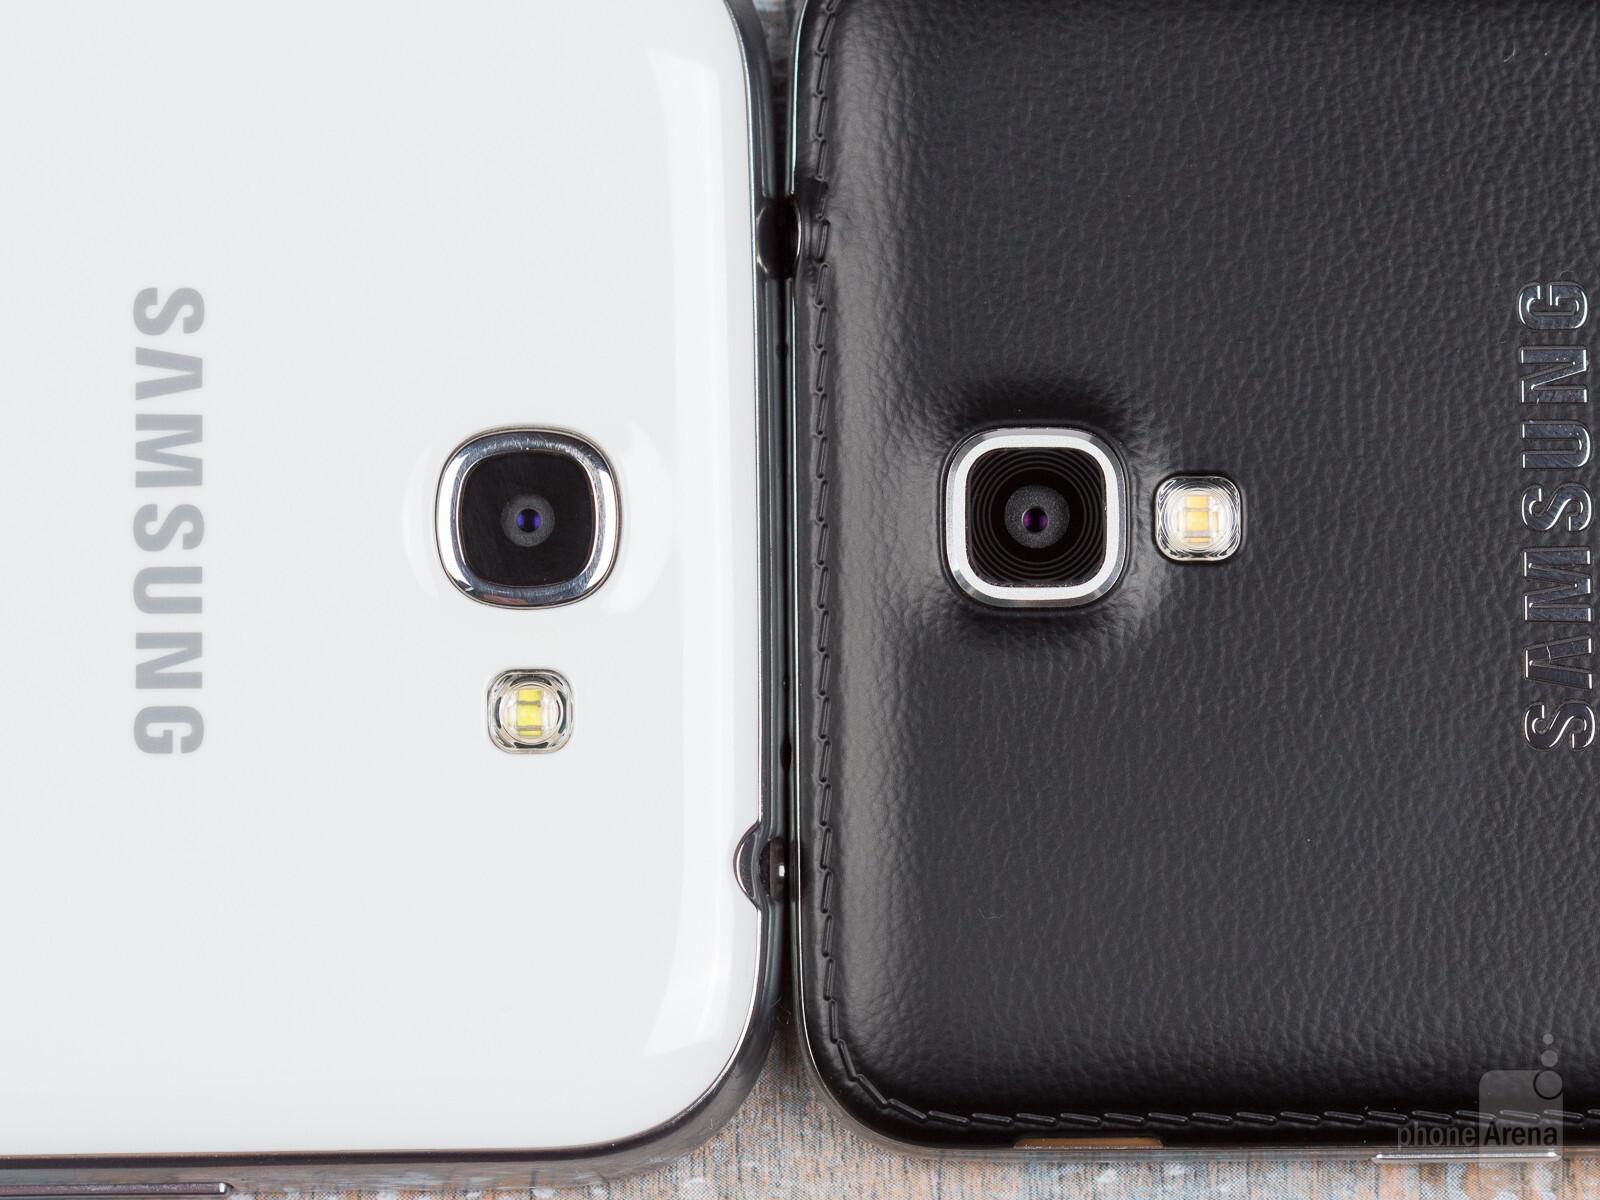 Samsung Galaxy Note 3 Neo White Samsung Galaxy Note 3 Neo vs